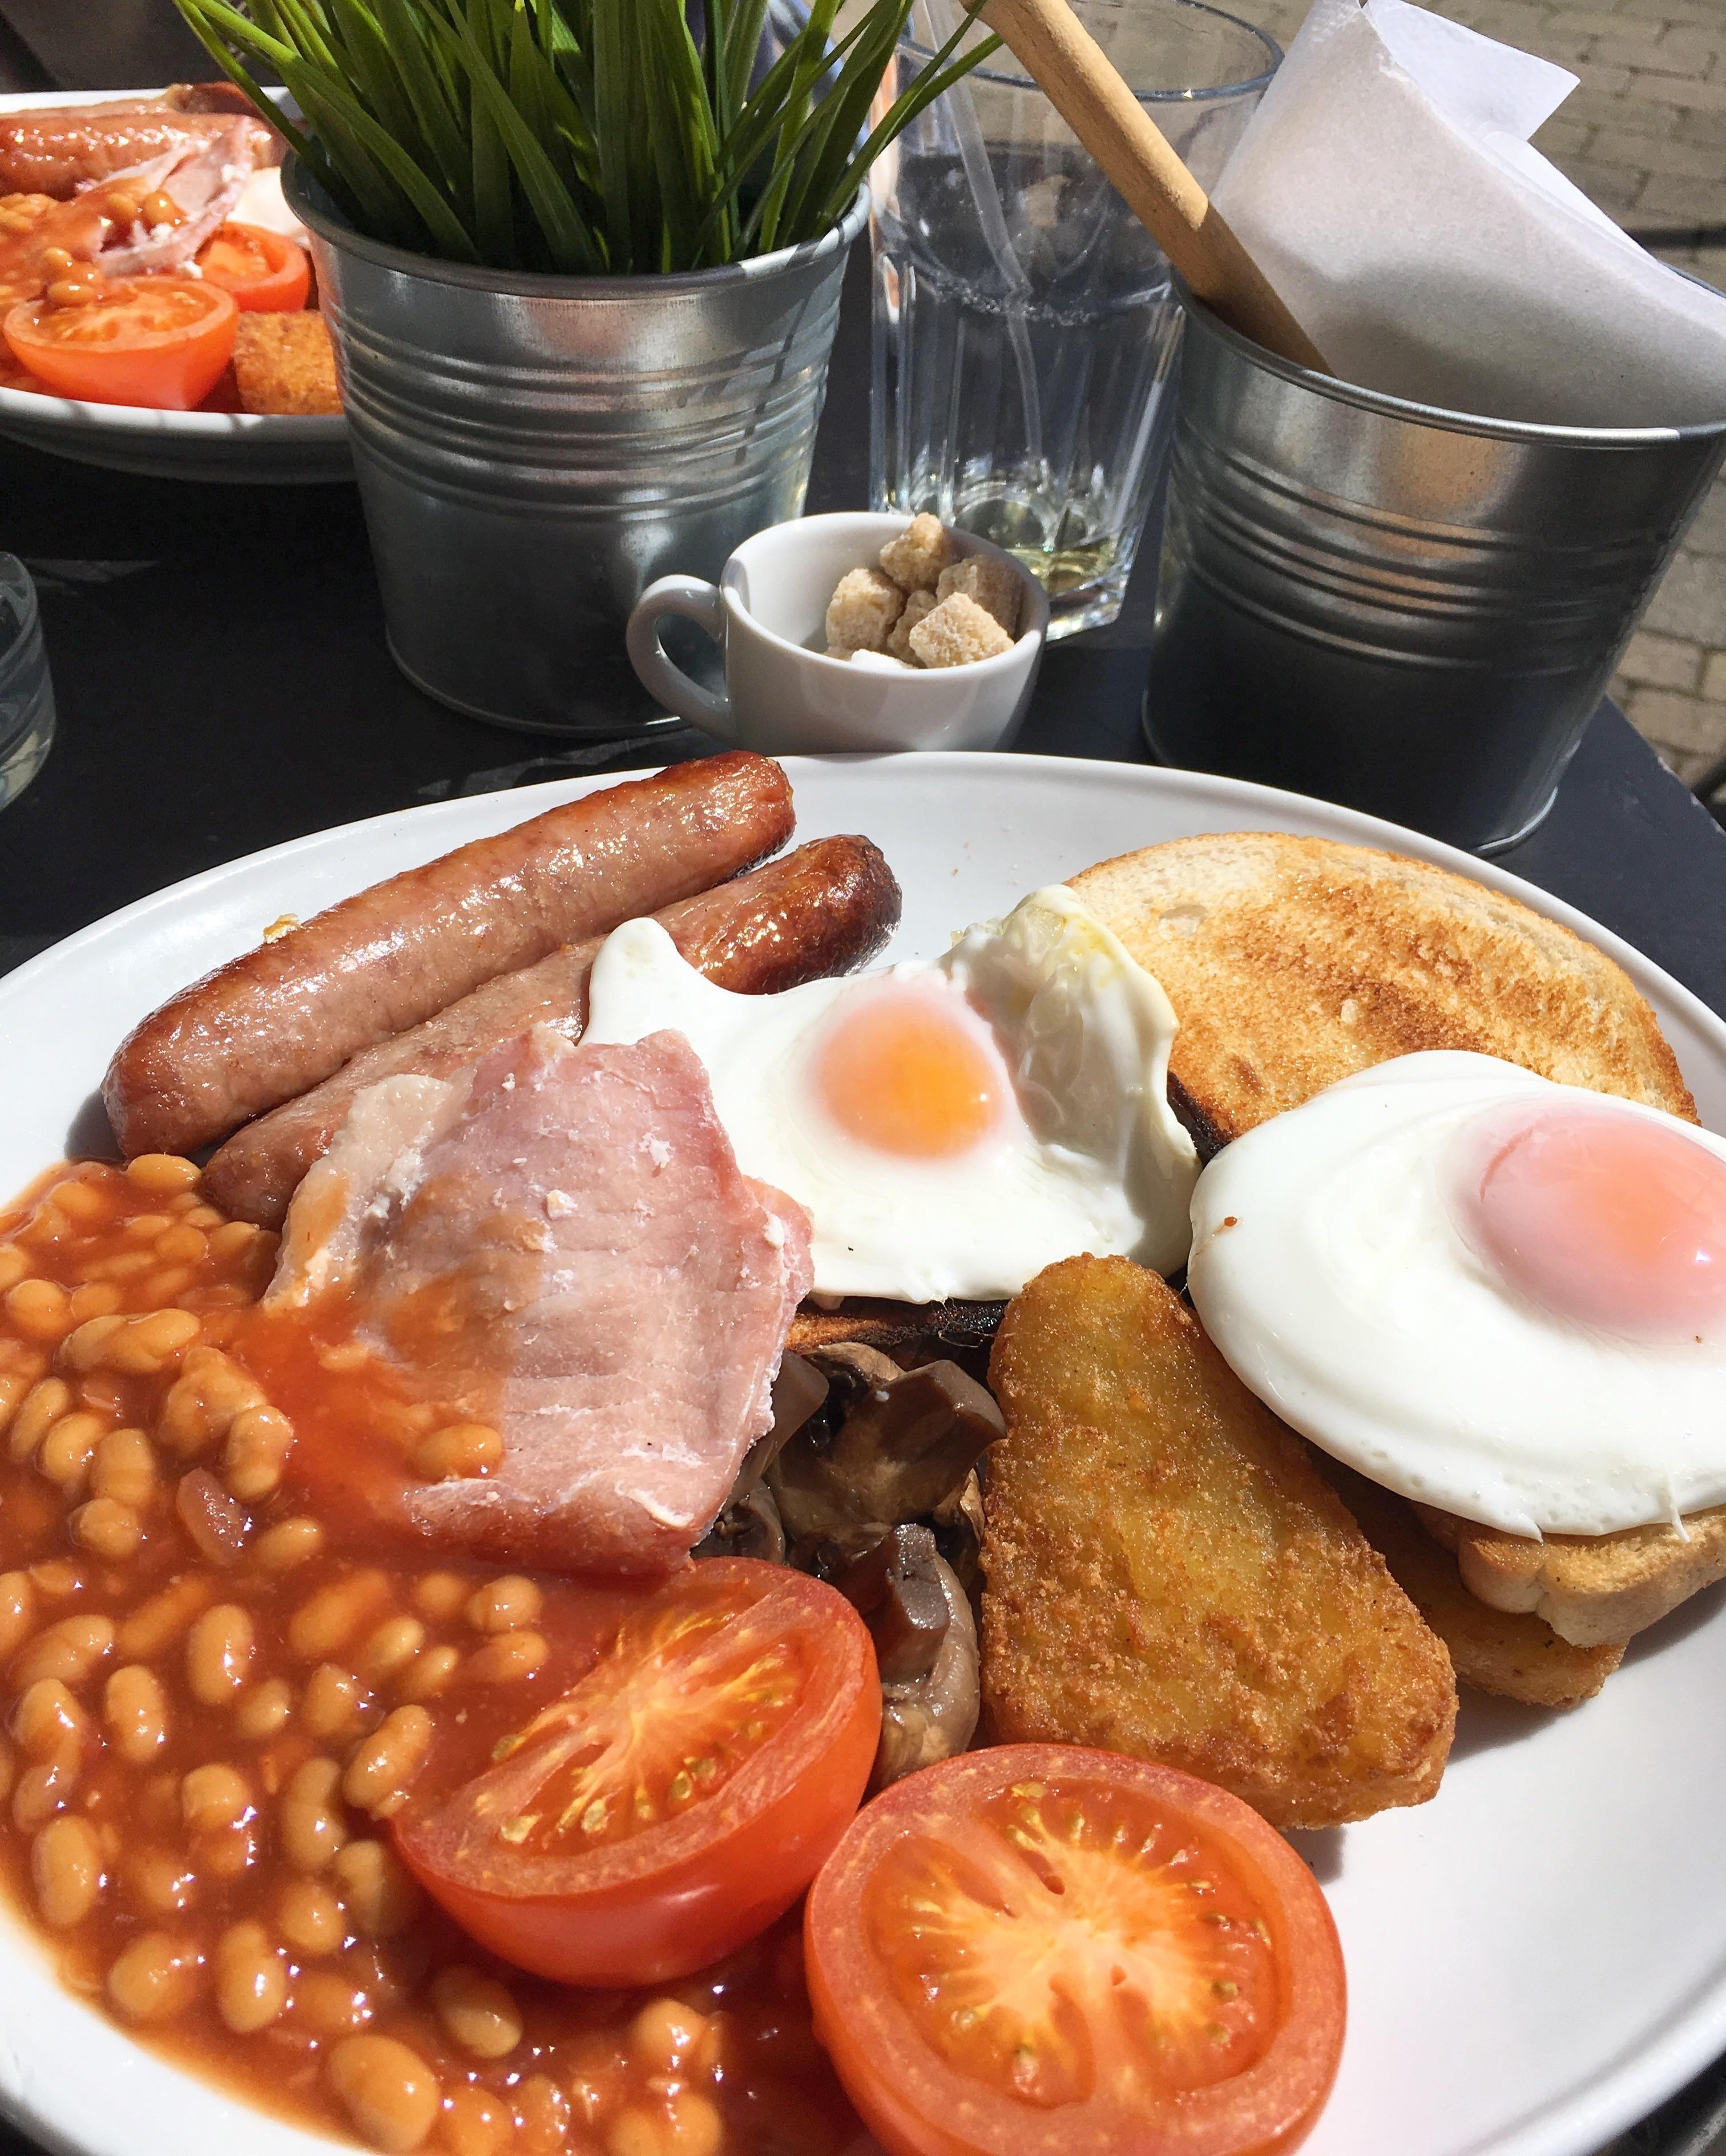 [I Ate] English Breakfast In Birmingham England